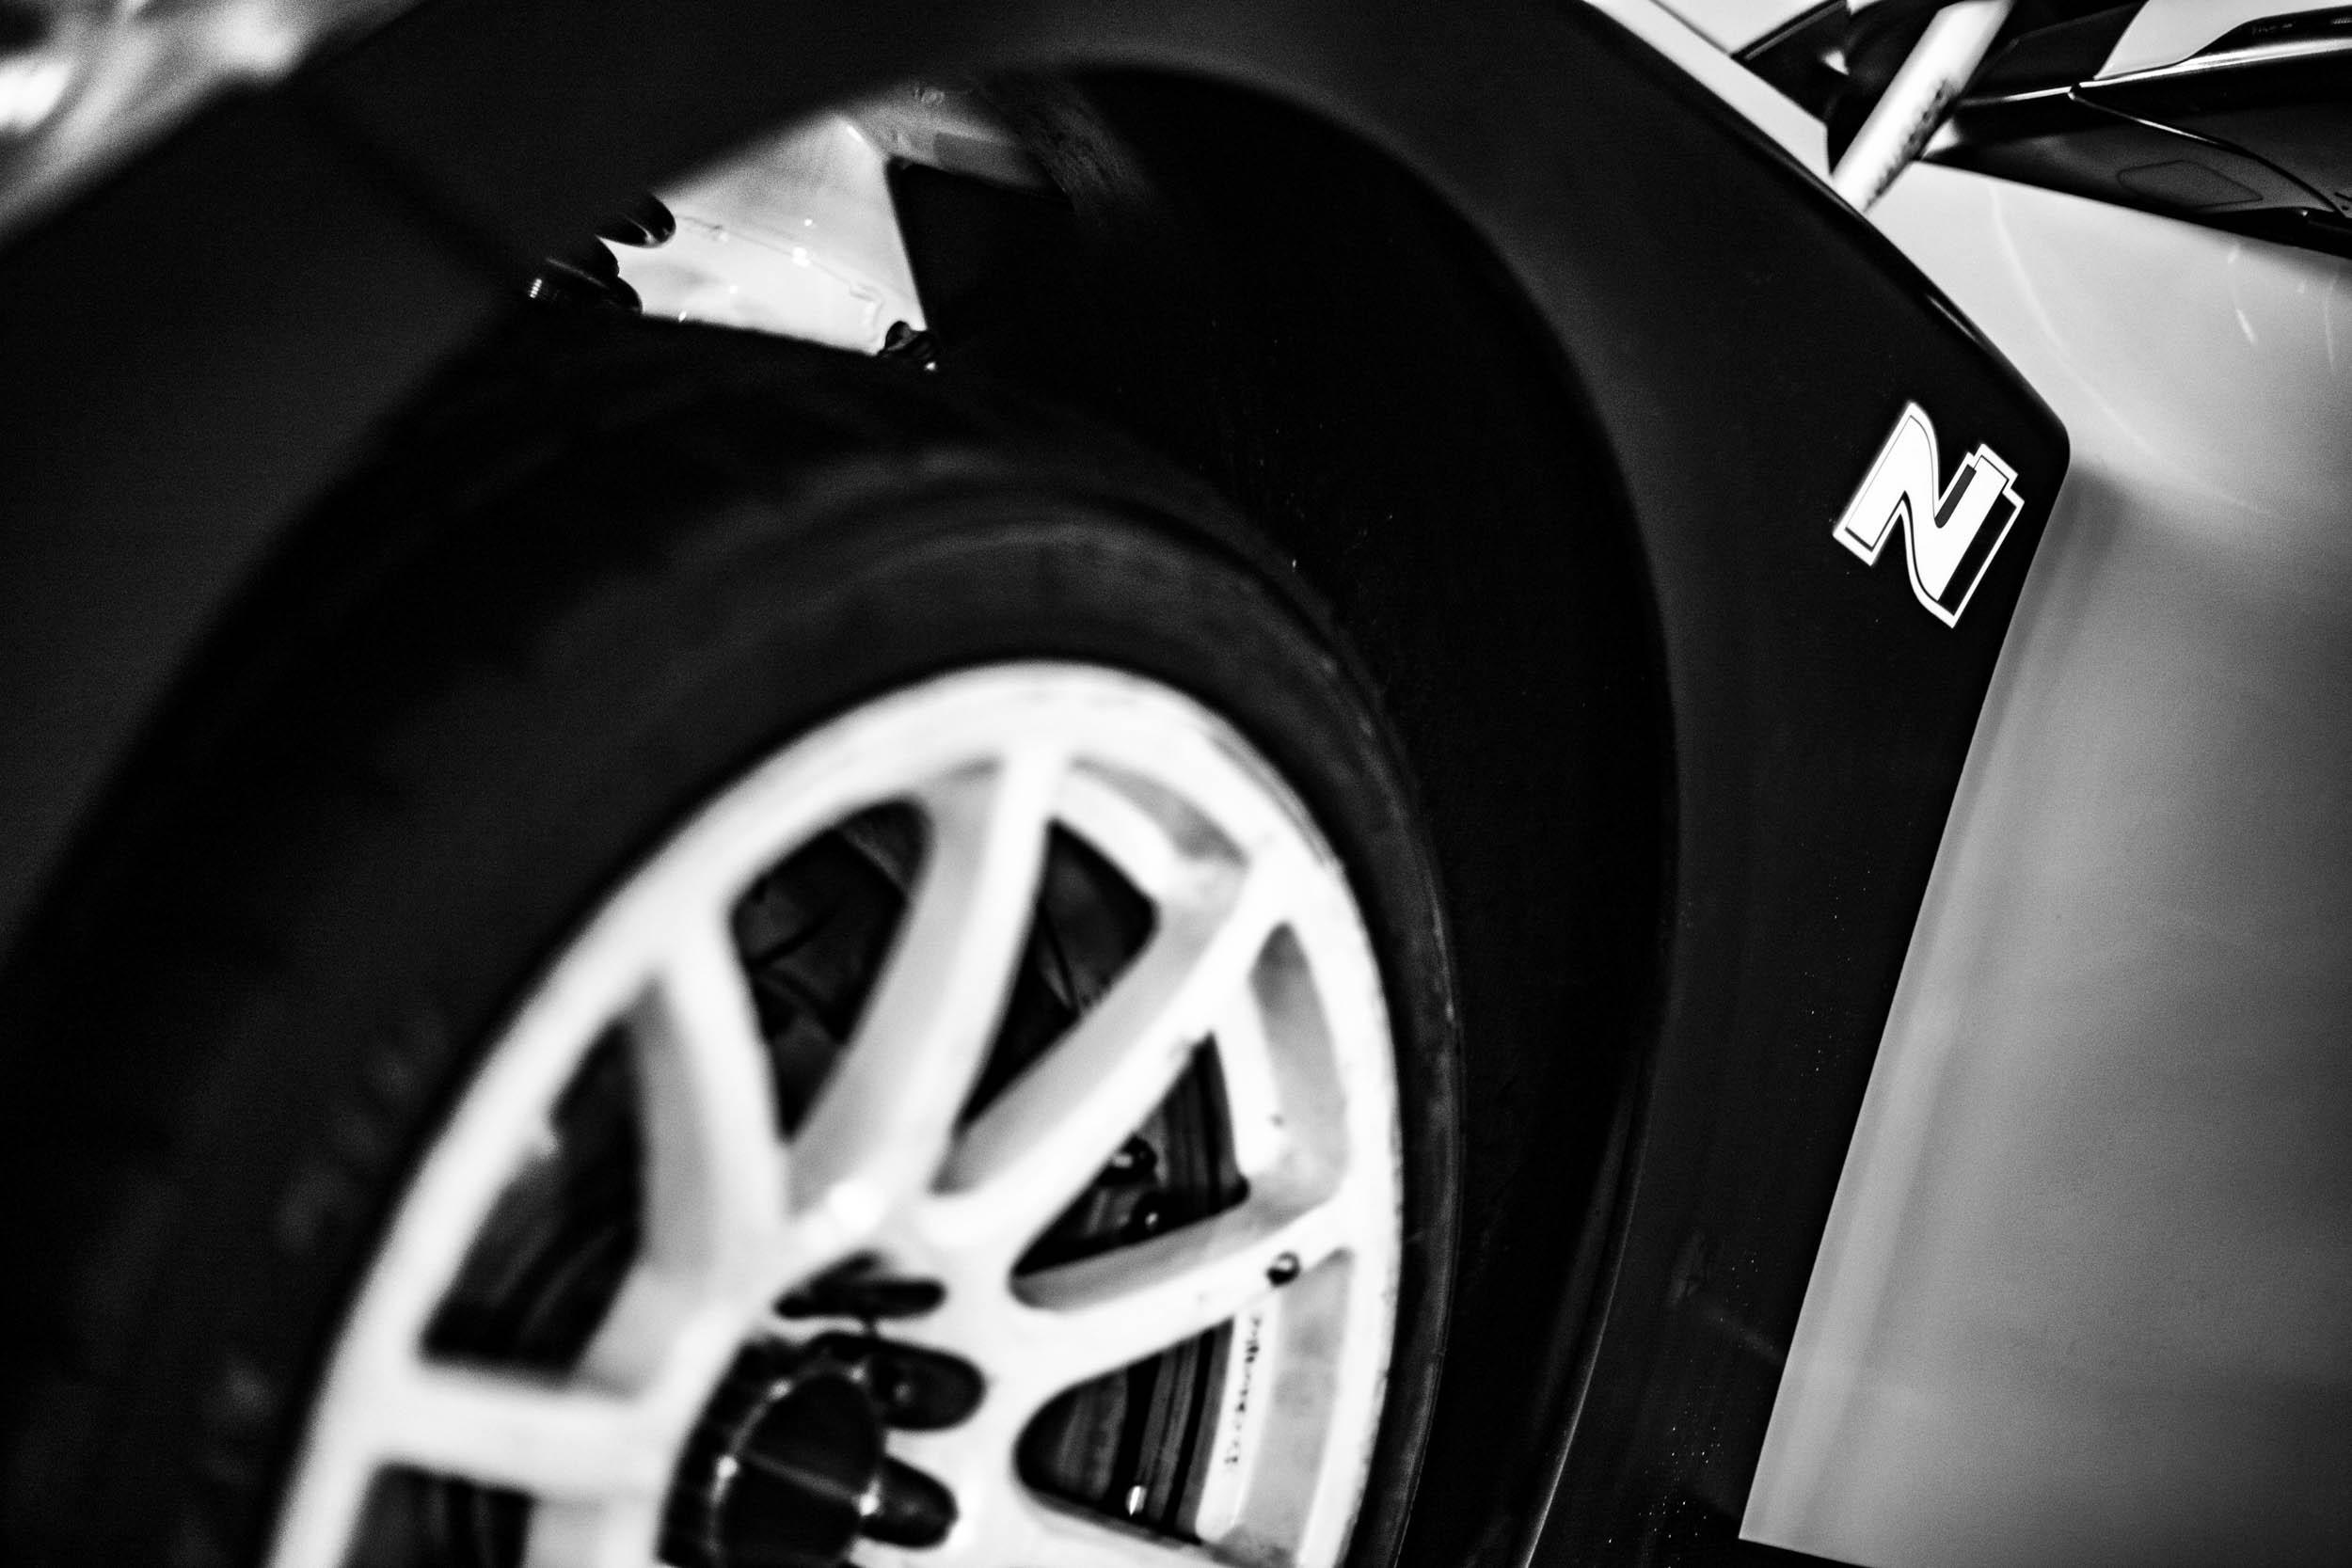 Hyundai Veloster N TCR wheel detail